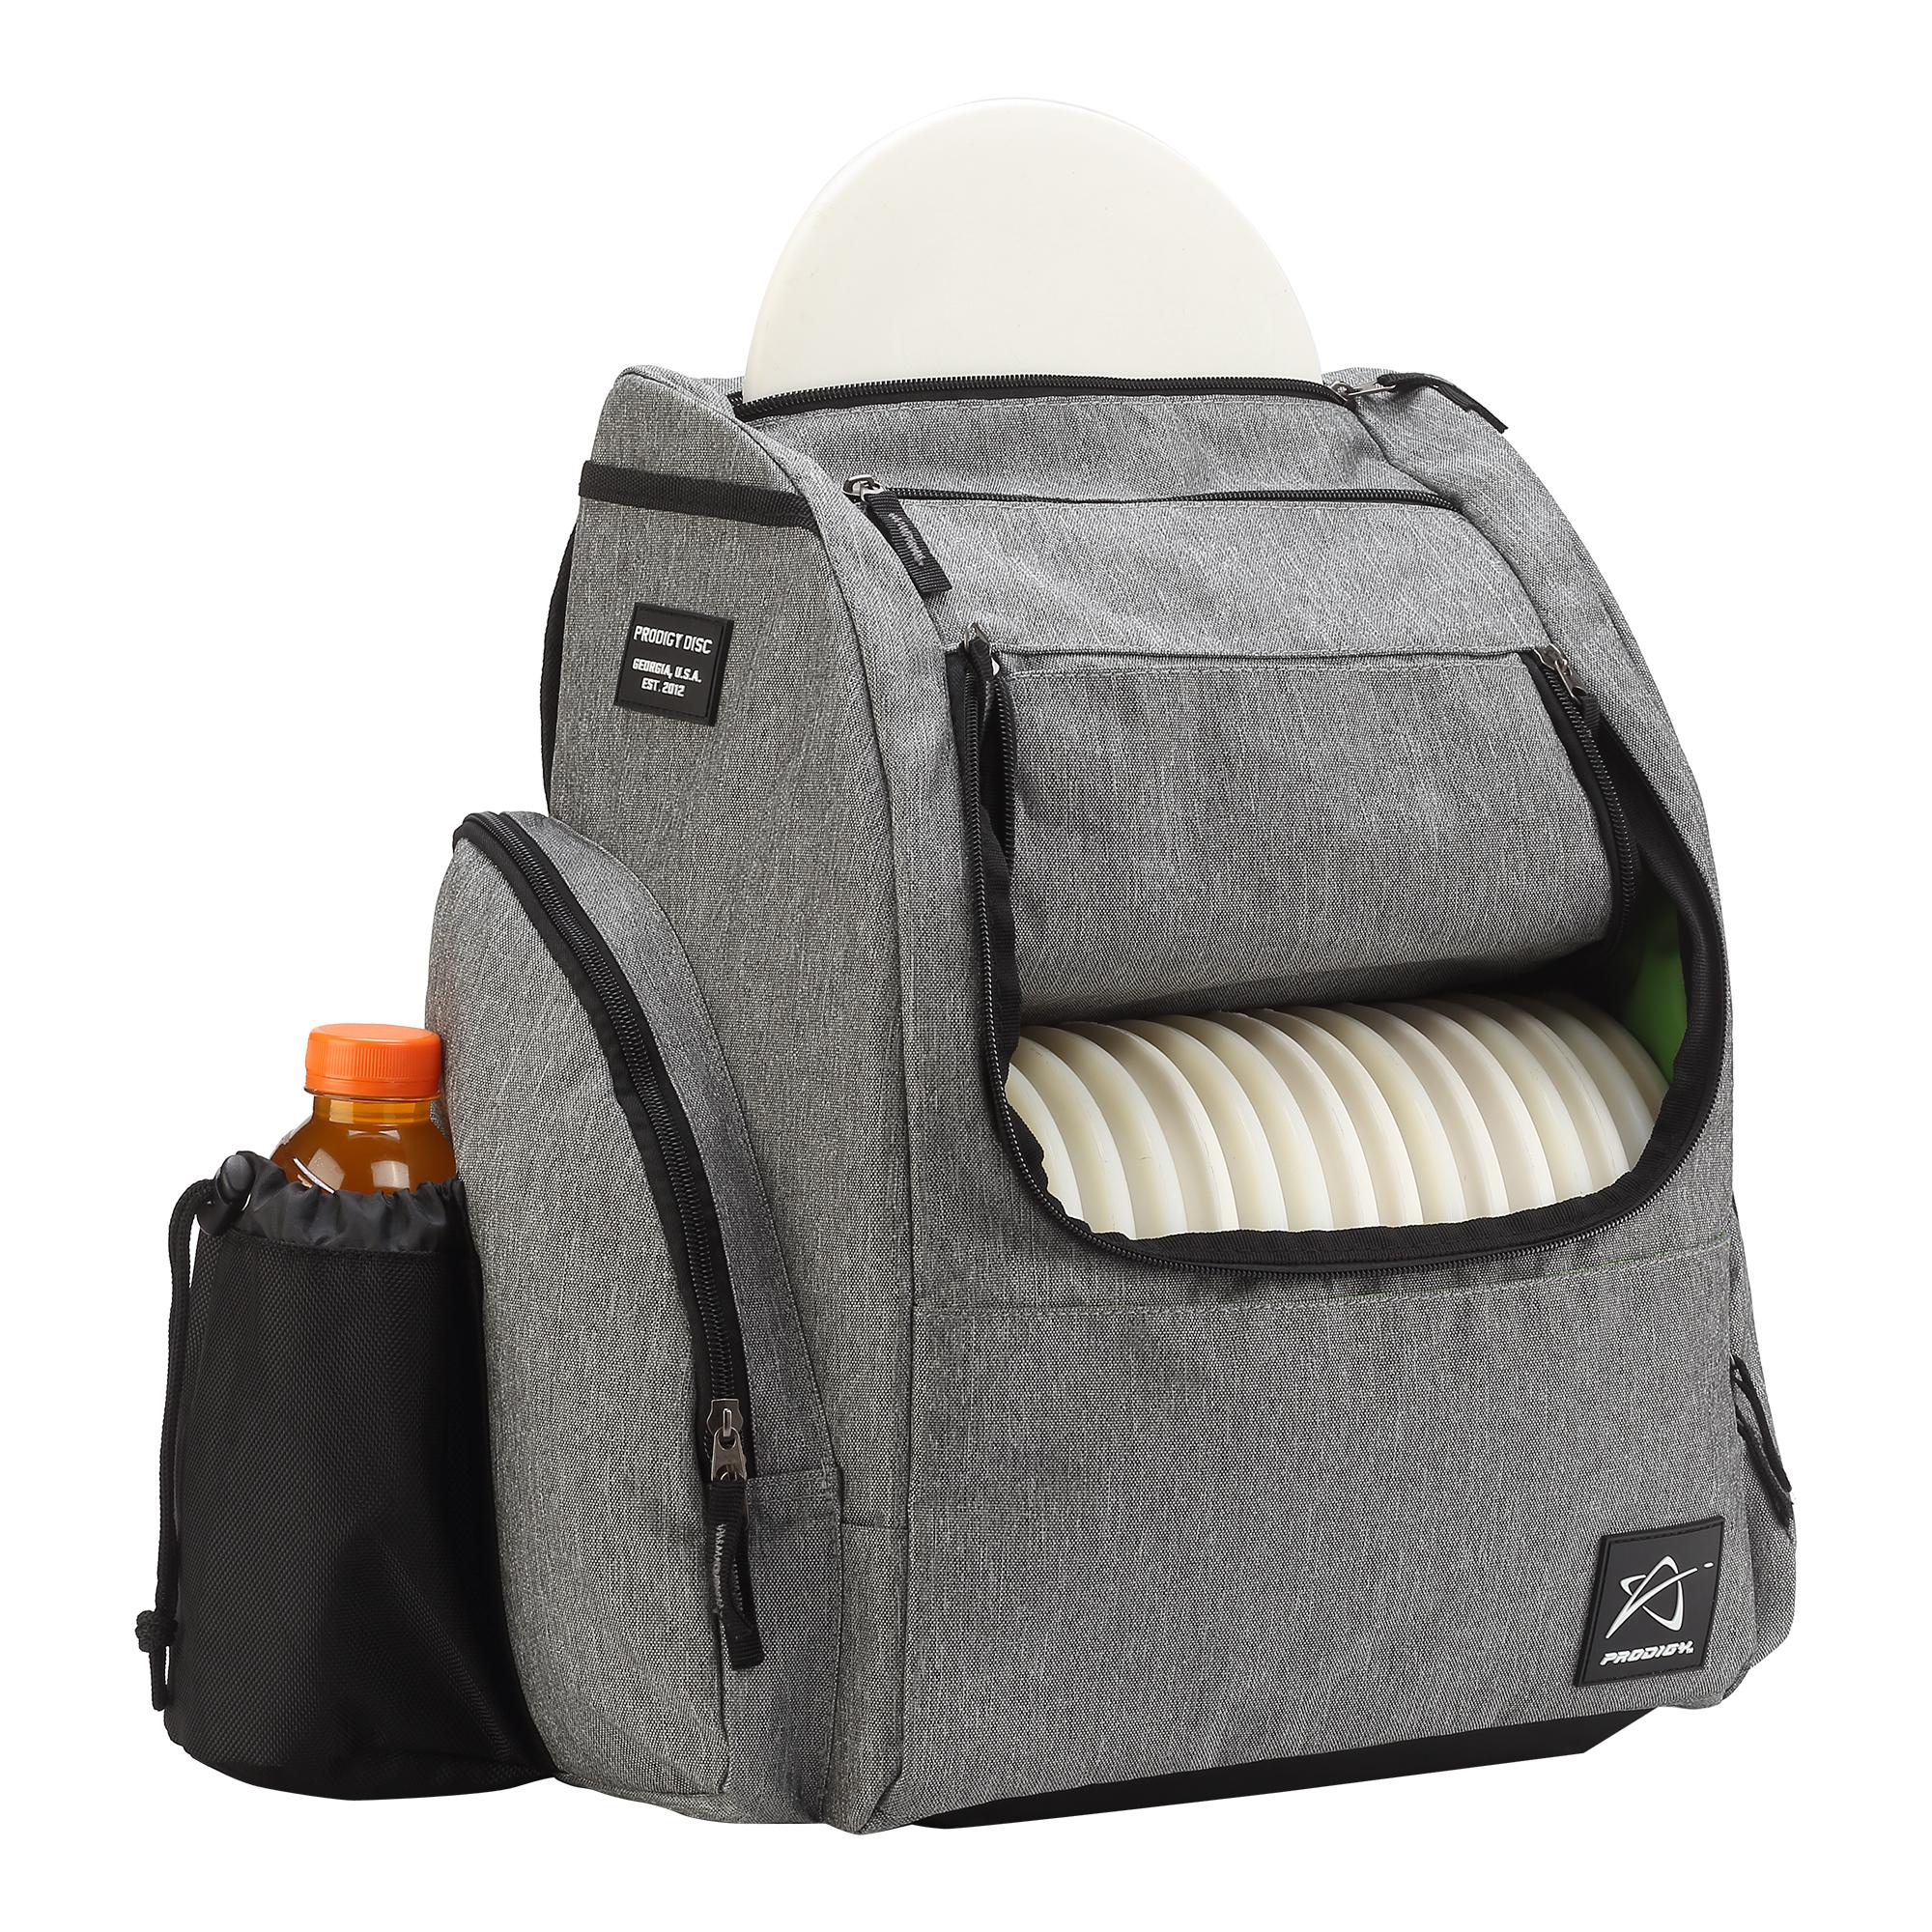 BP-2 Backpack (2019 Model)